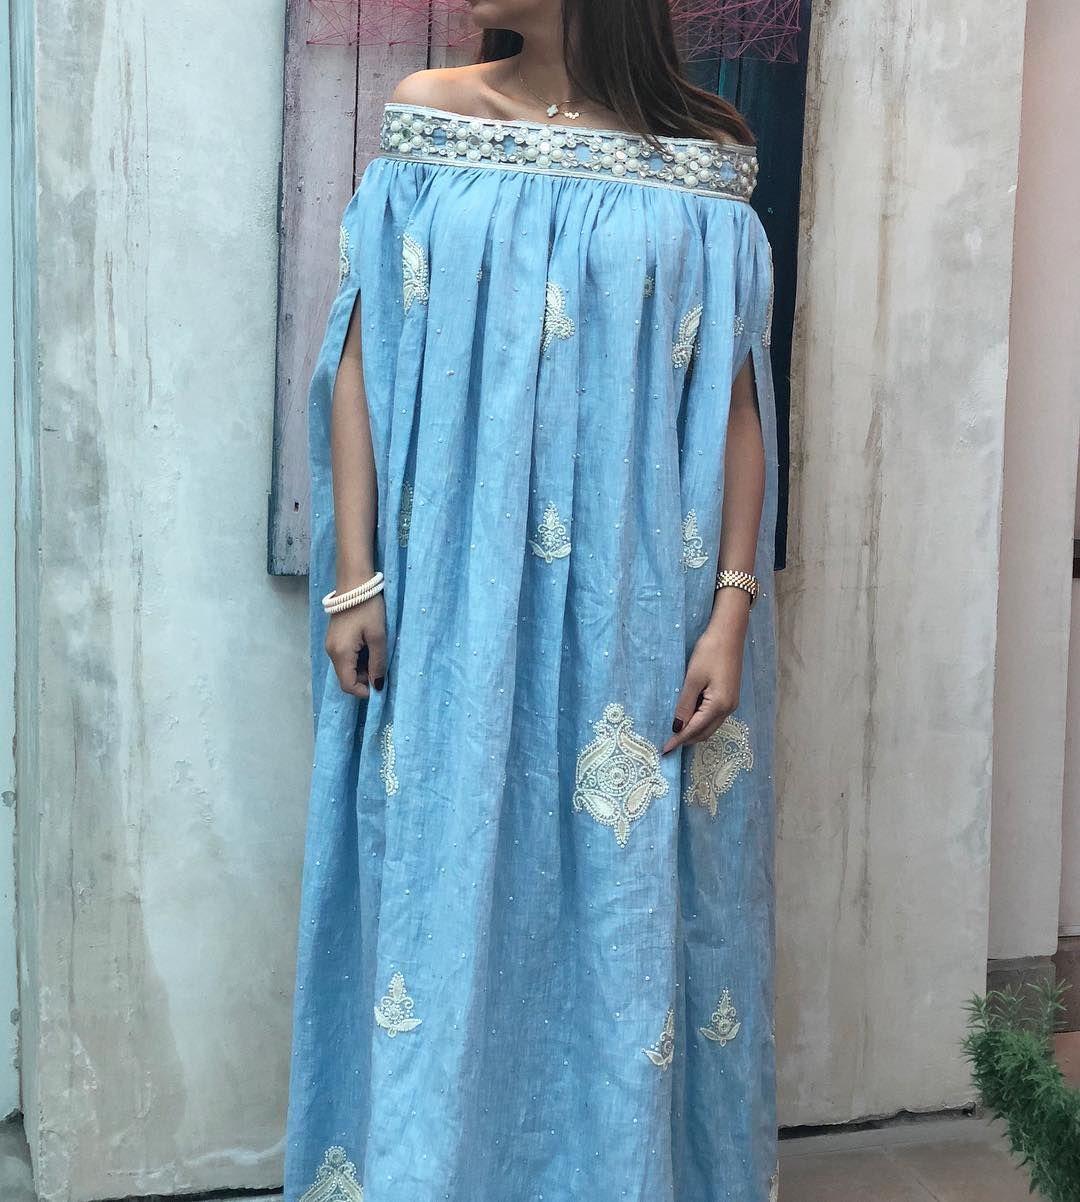 Mahra By Ta2 Marbouta Arabic Ramadan Fashion Jalabiyat Kaftans Daraat African Print Fashion Dresses African Maxi Dresses African Fashion Dresses